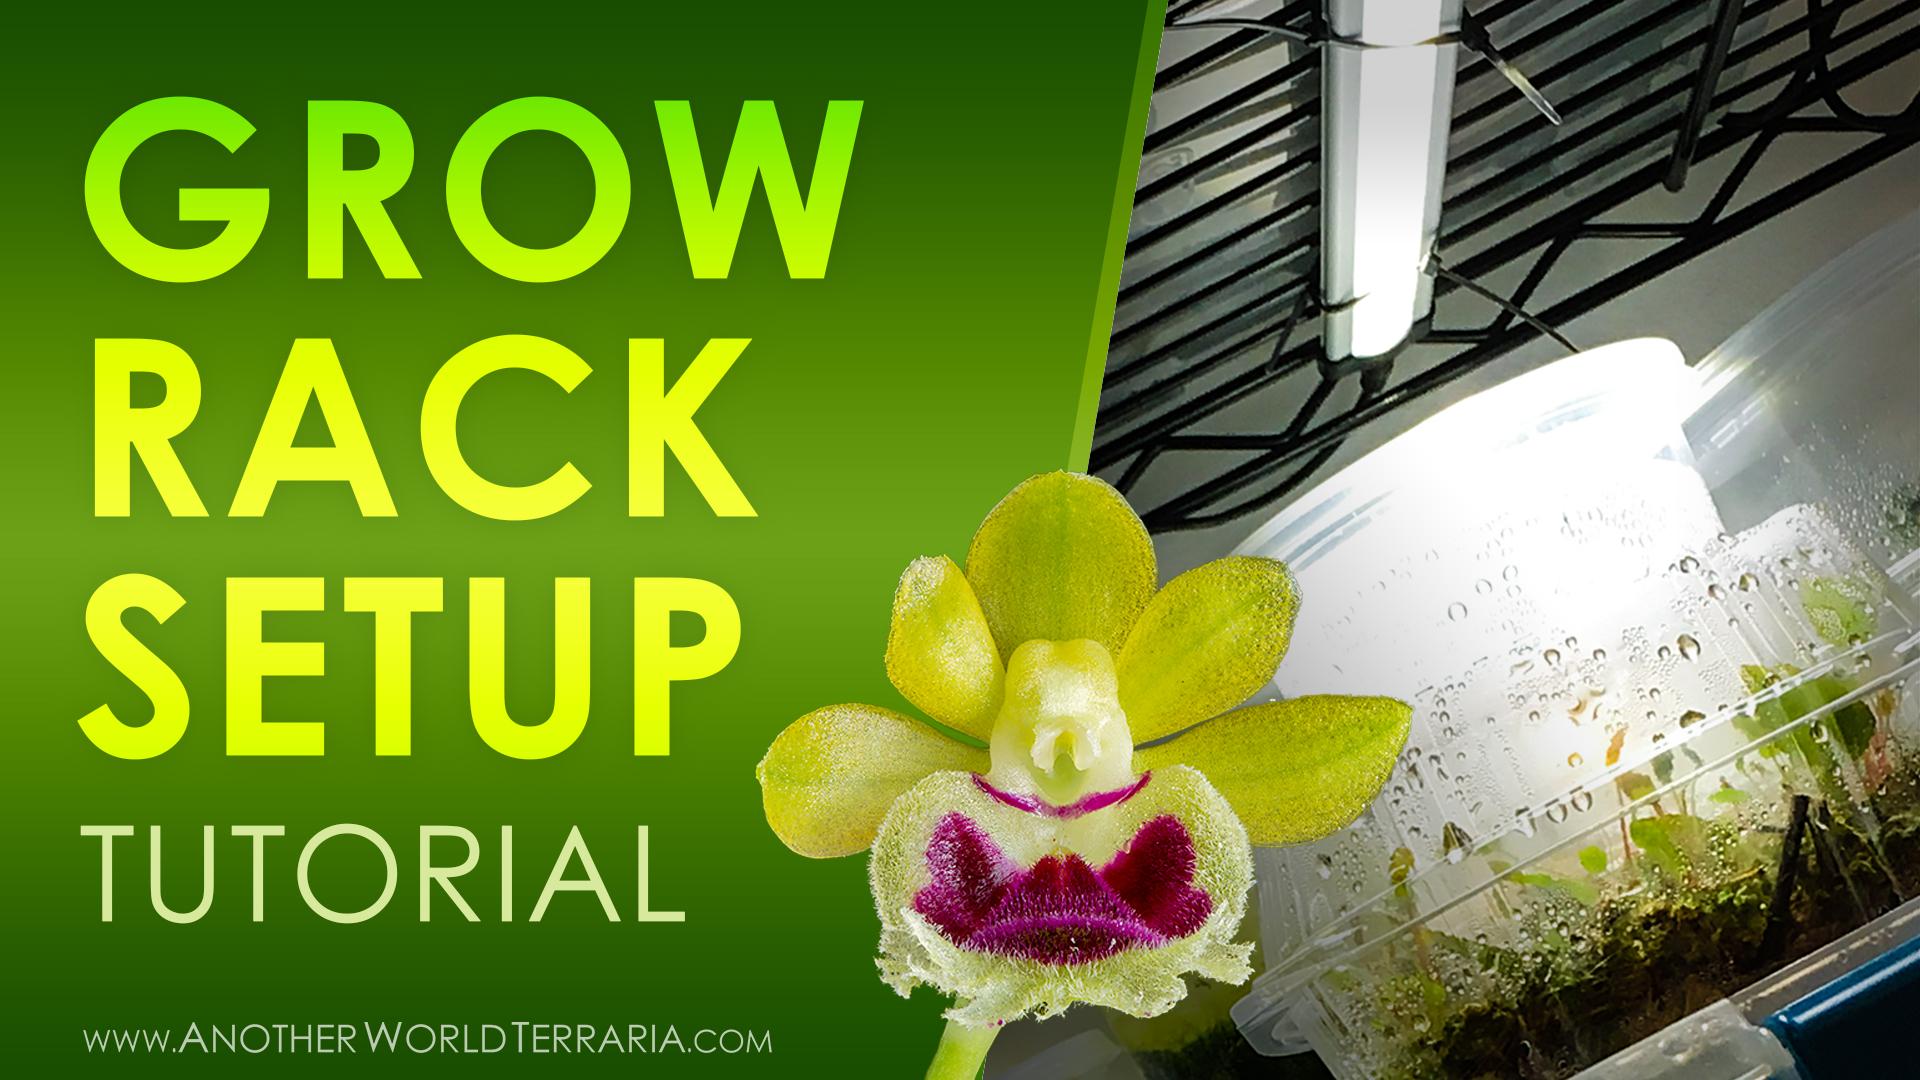 Grow Rack Setup Tutorial